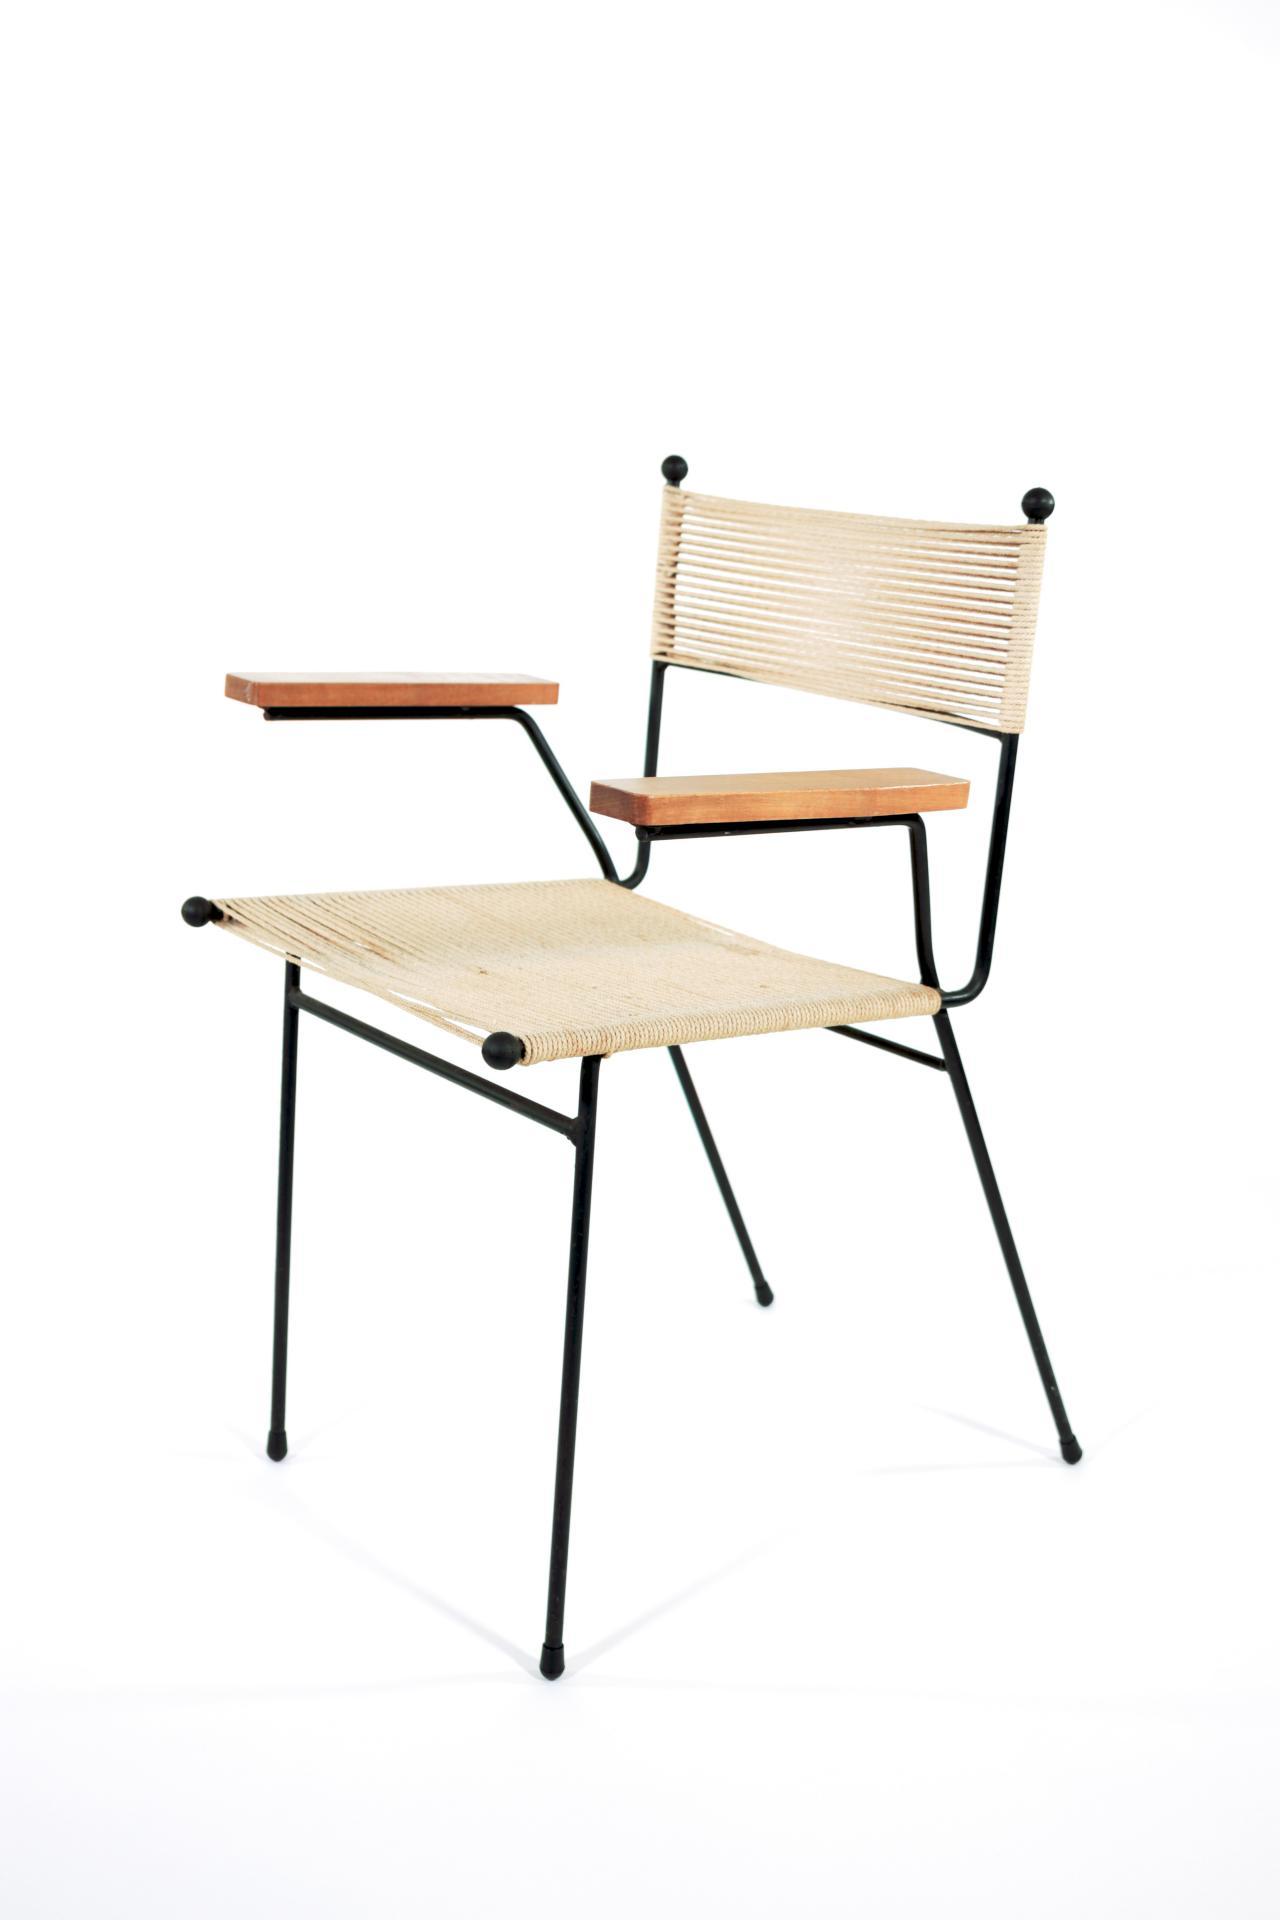 Phenomenal Clement Meadmore The Art Of Mid Century Design Ngv Spiritservingveterans Wood Chair Design Ideas Spiritservingveteransorg